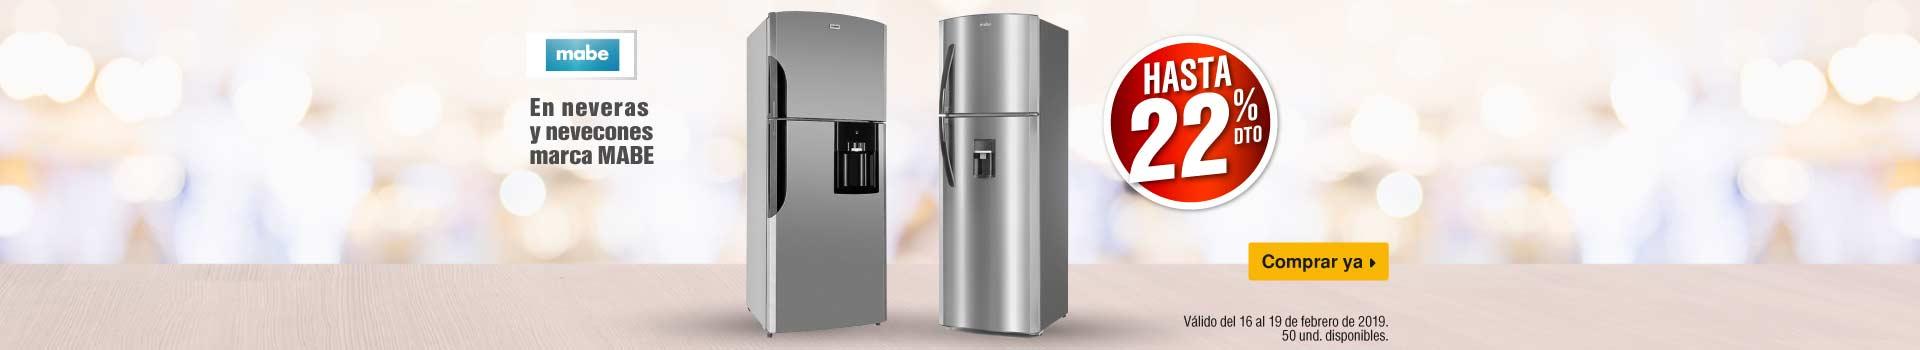 AK-KT-mayores-1-ELECT-BCAT-refrigeracion-150219